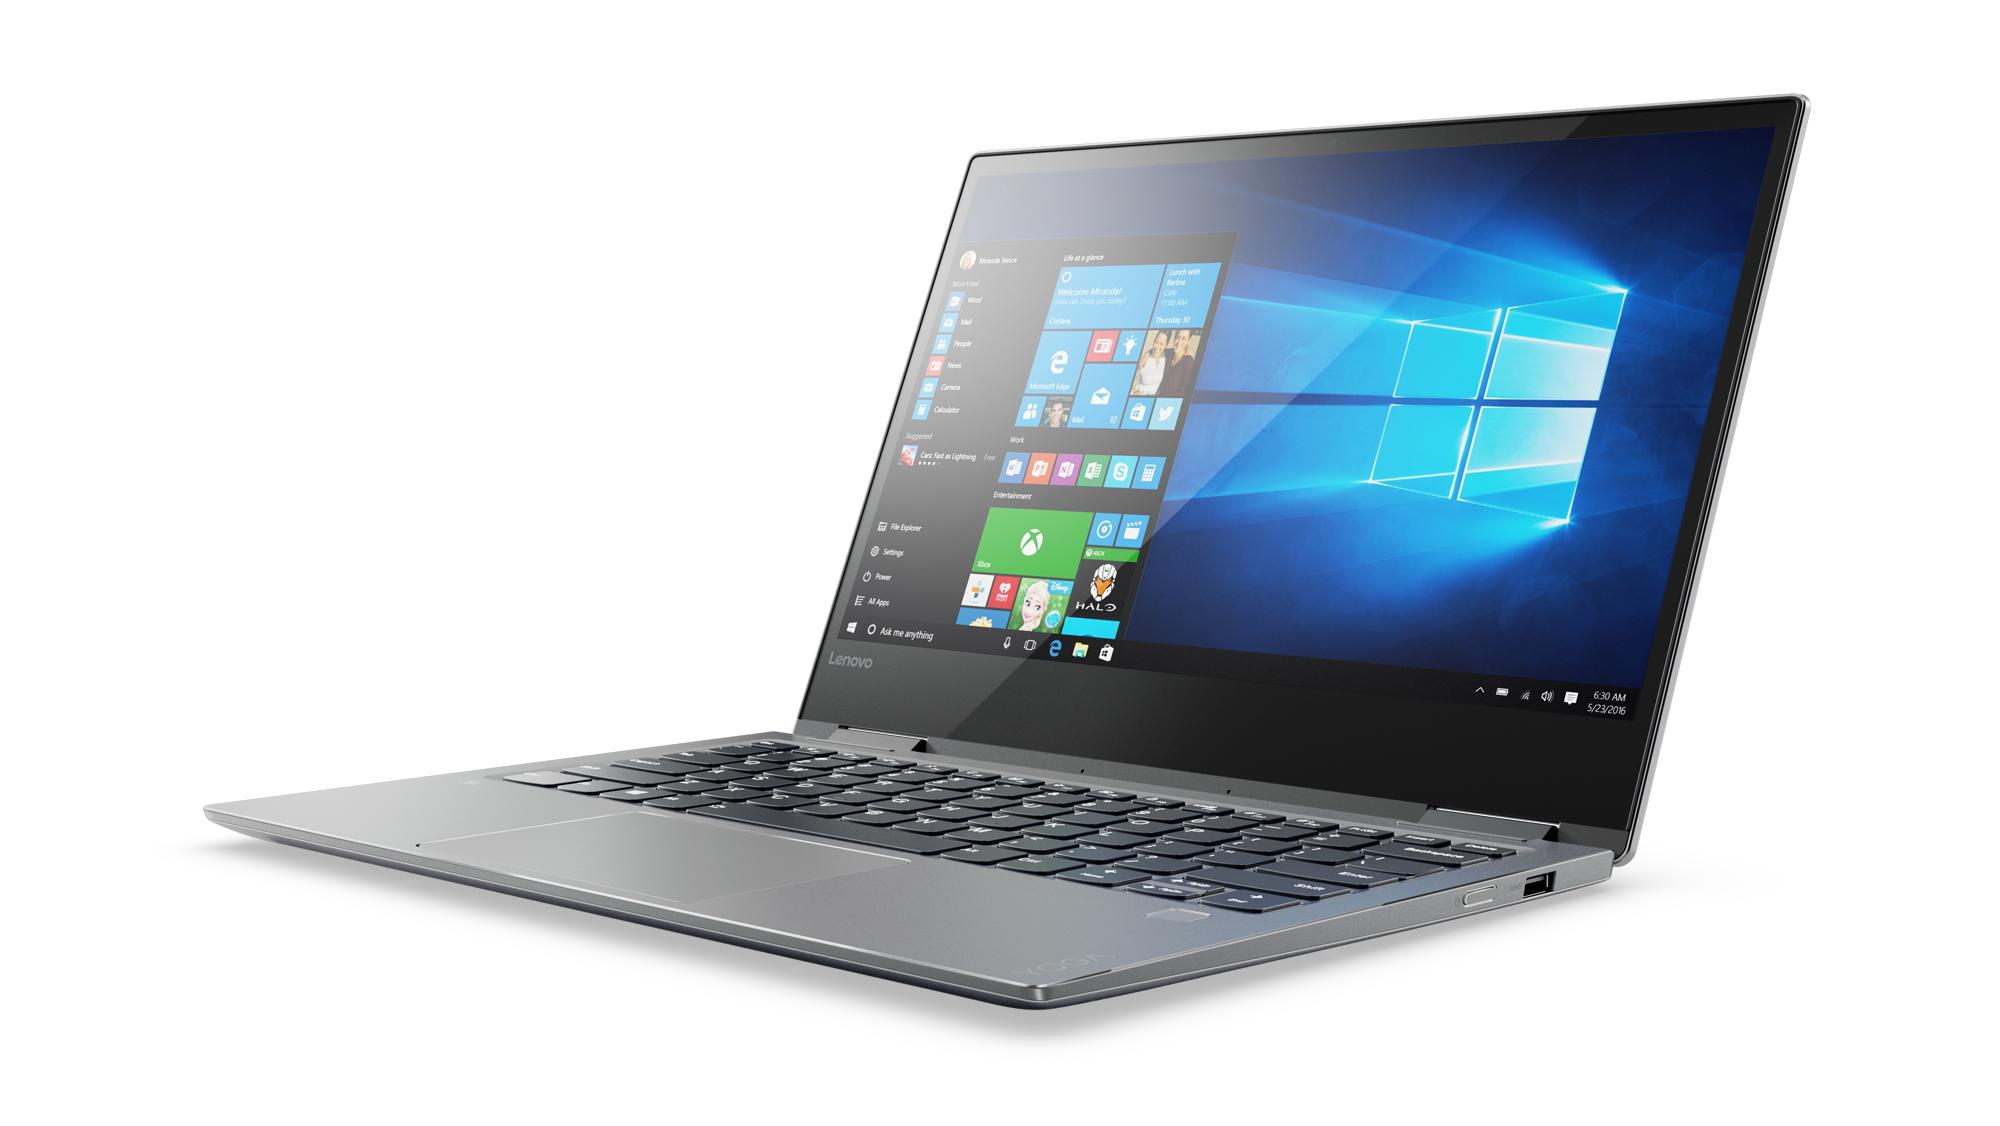 "Lenovo YOGA 720-13IKB i5-7200U 3,10GHz/8GB/SSD 256GB/13,3"" FHD/IPS/AG/multitouch/WIN10 šedá 80X6006SCK"